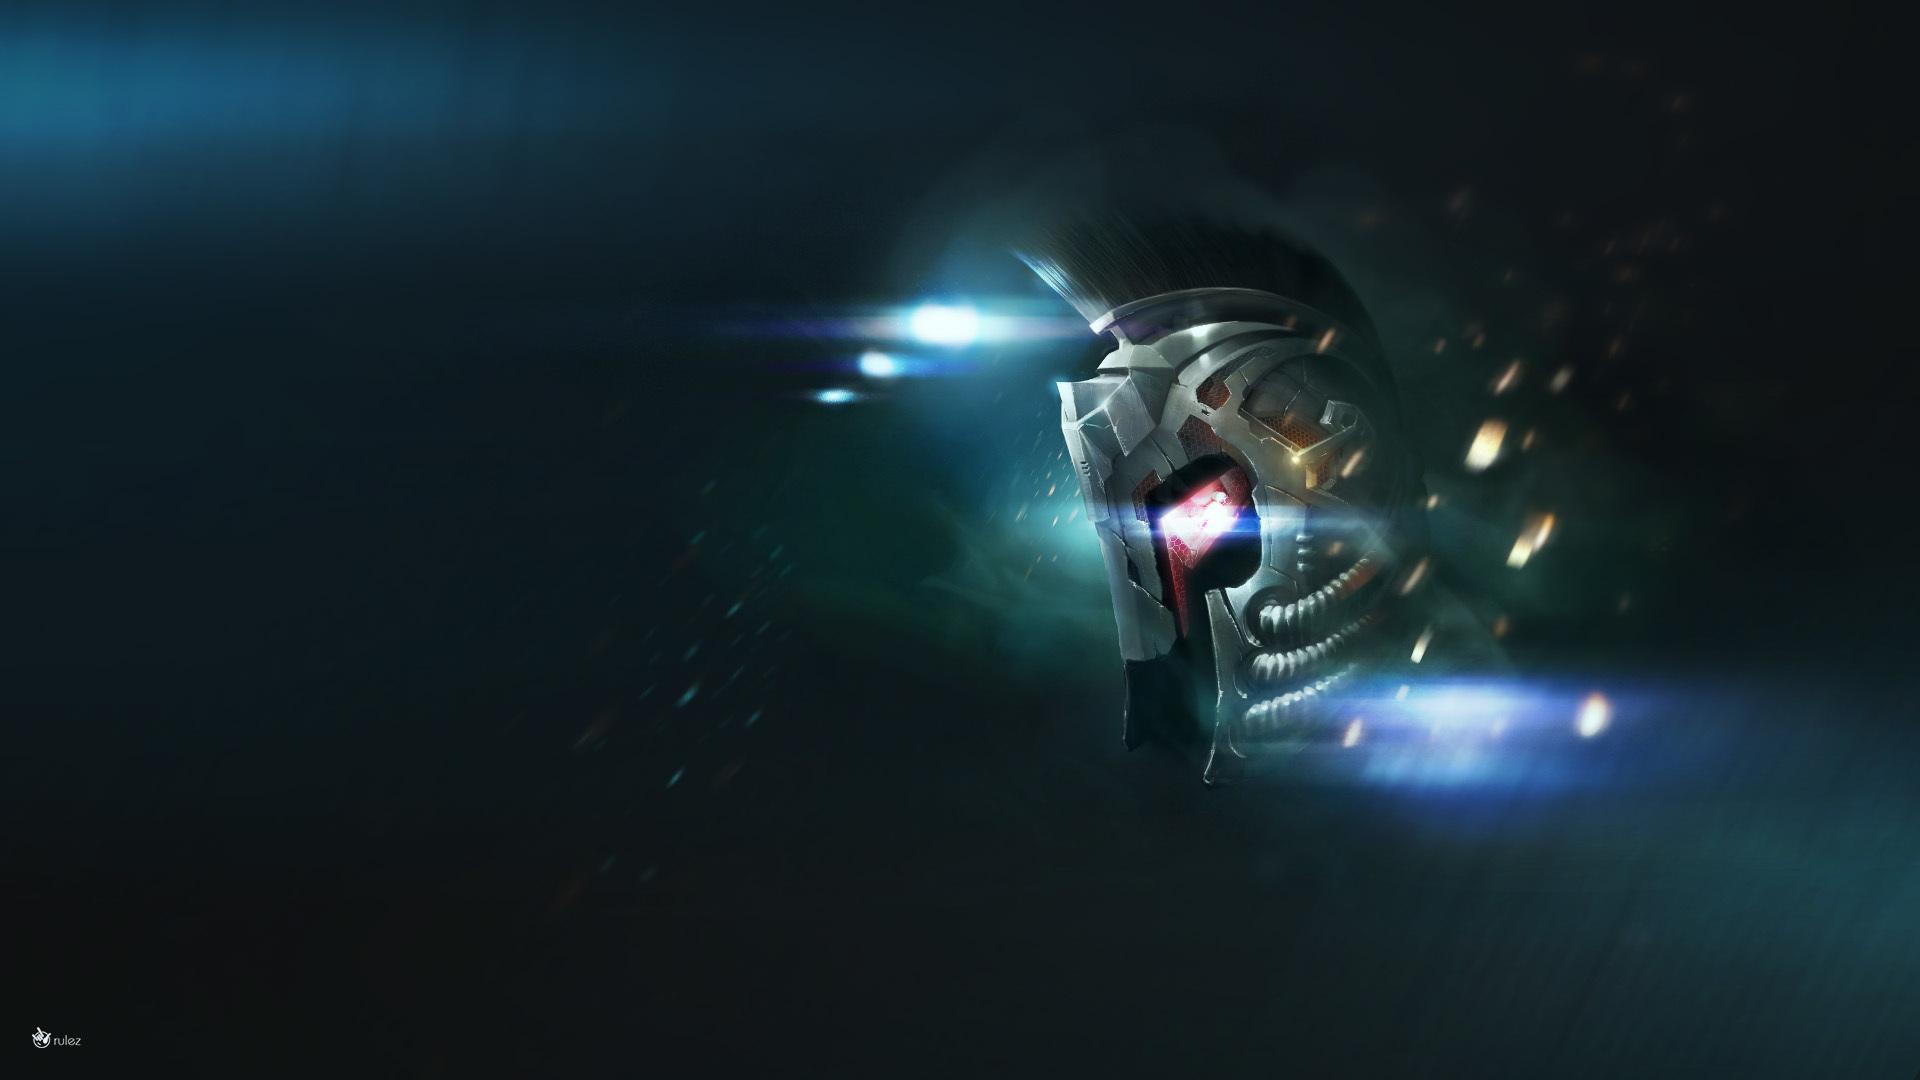 Fantasy Cyborg Trooper 30 Views Hd Wallpaper Picture 1680x1050